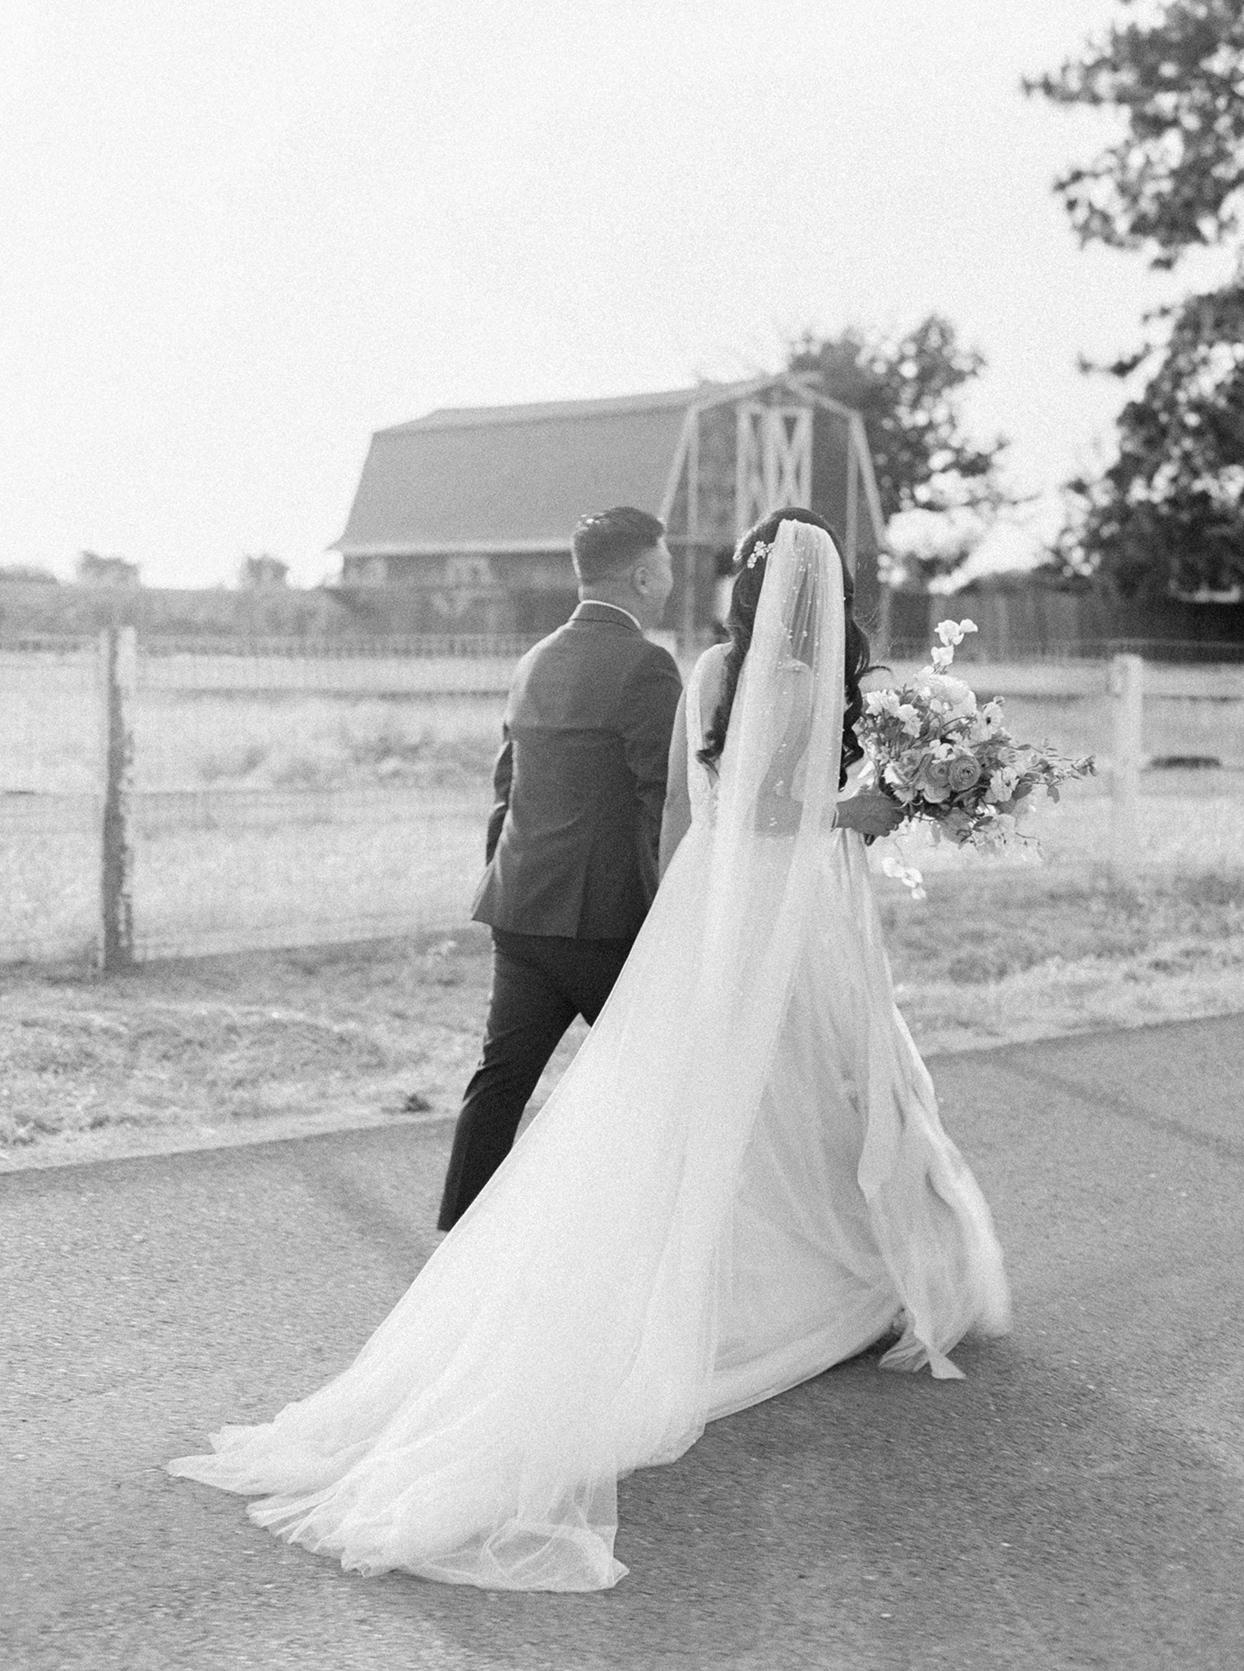 thuy kahn wedding couple walking down road